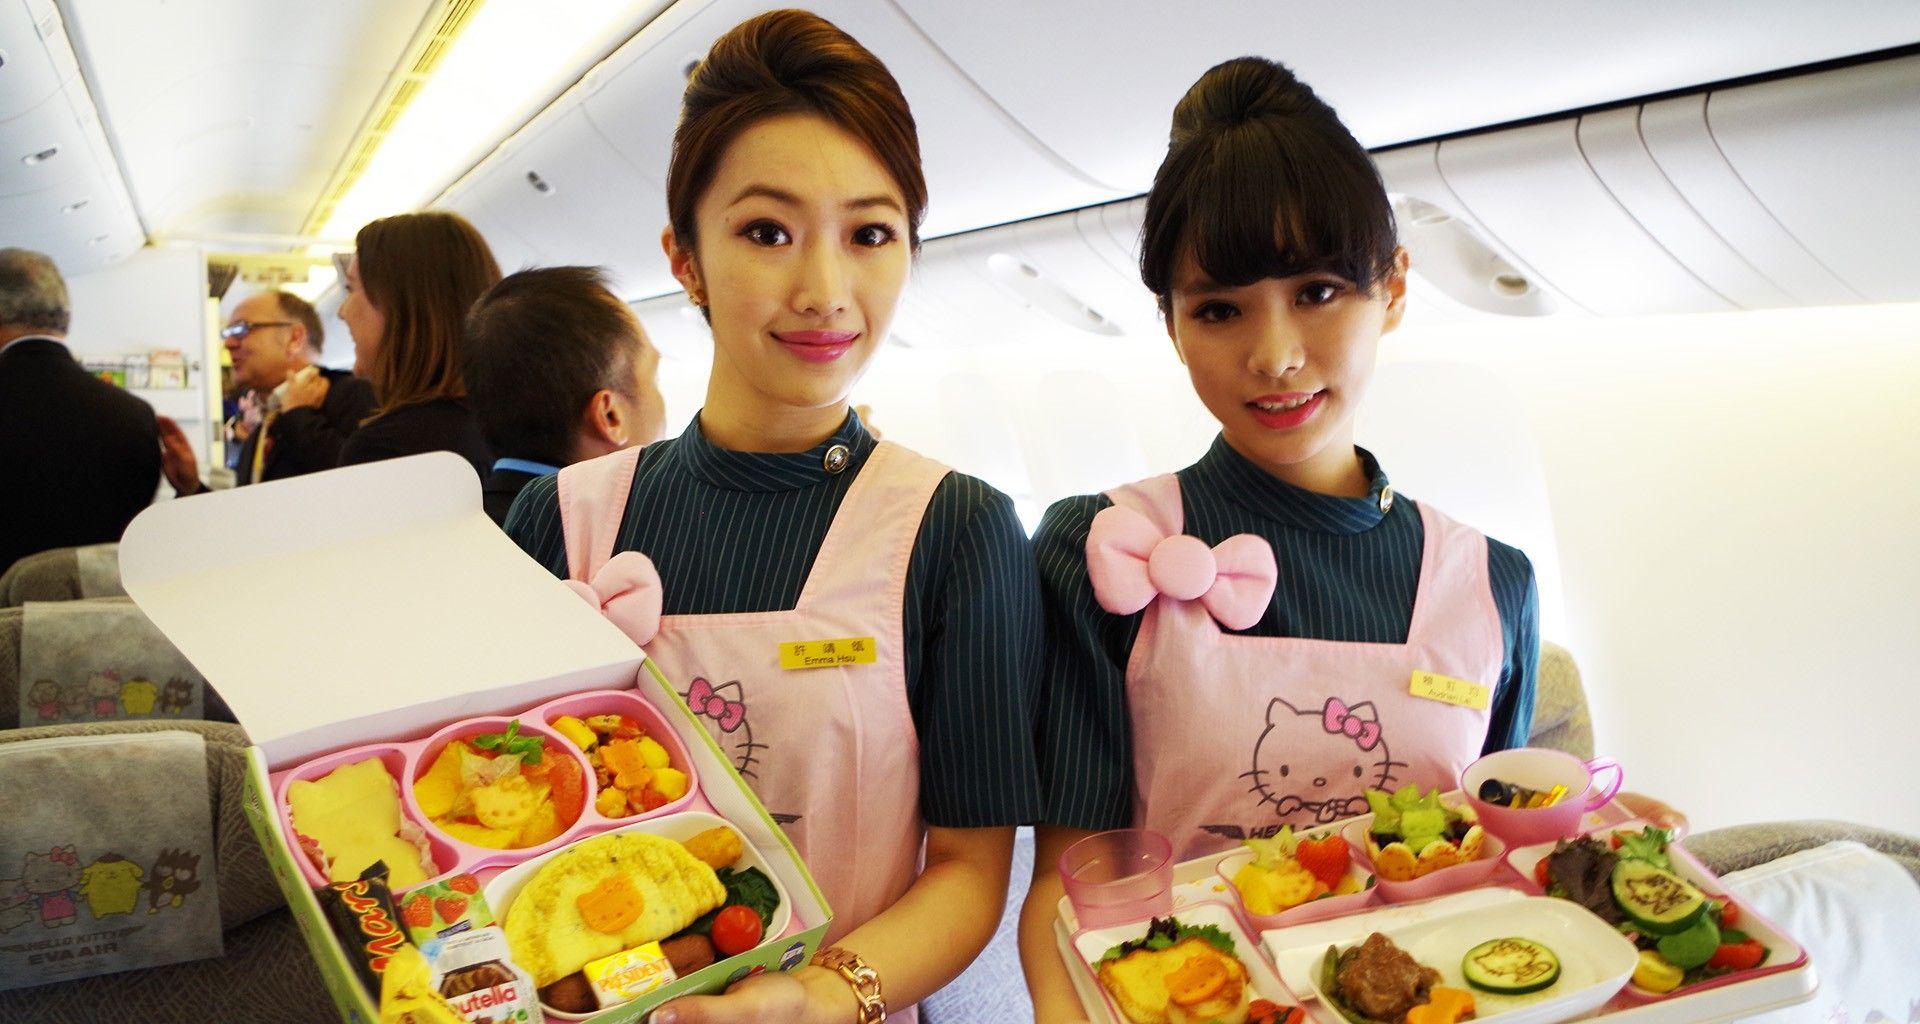 Review The EVA Air Hello Kitty Experience Economy Class